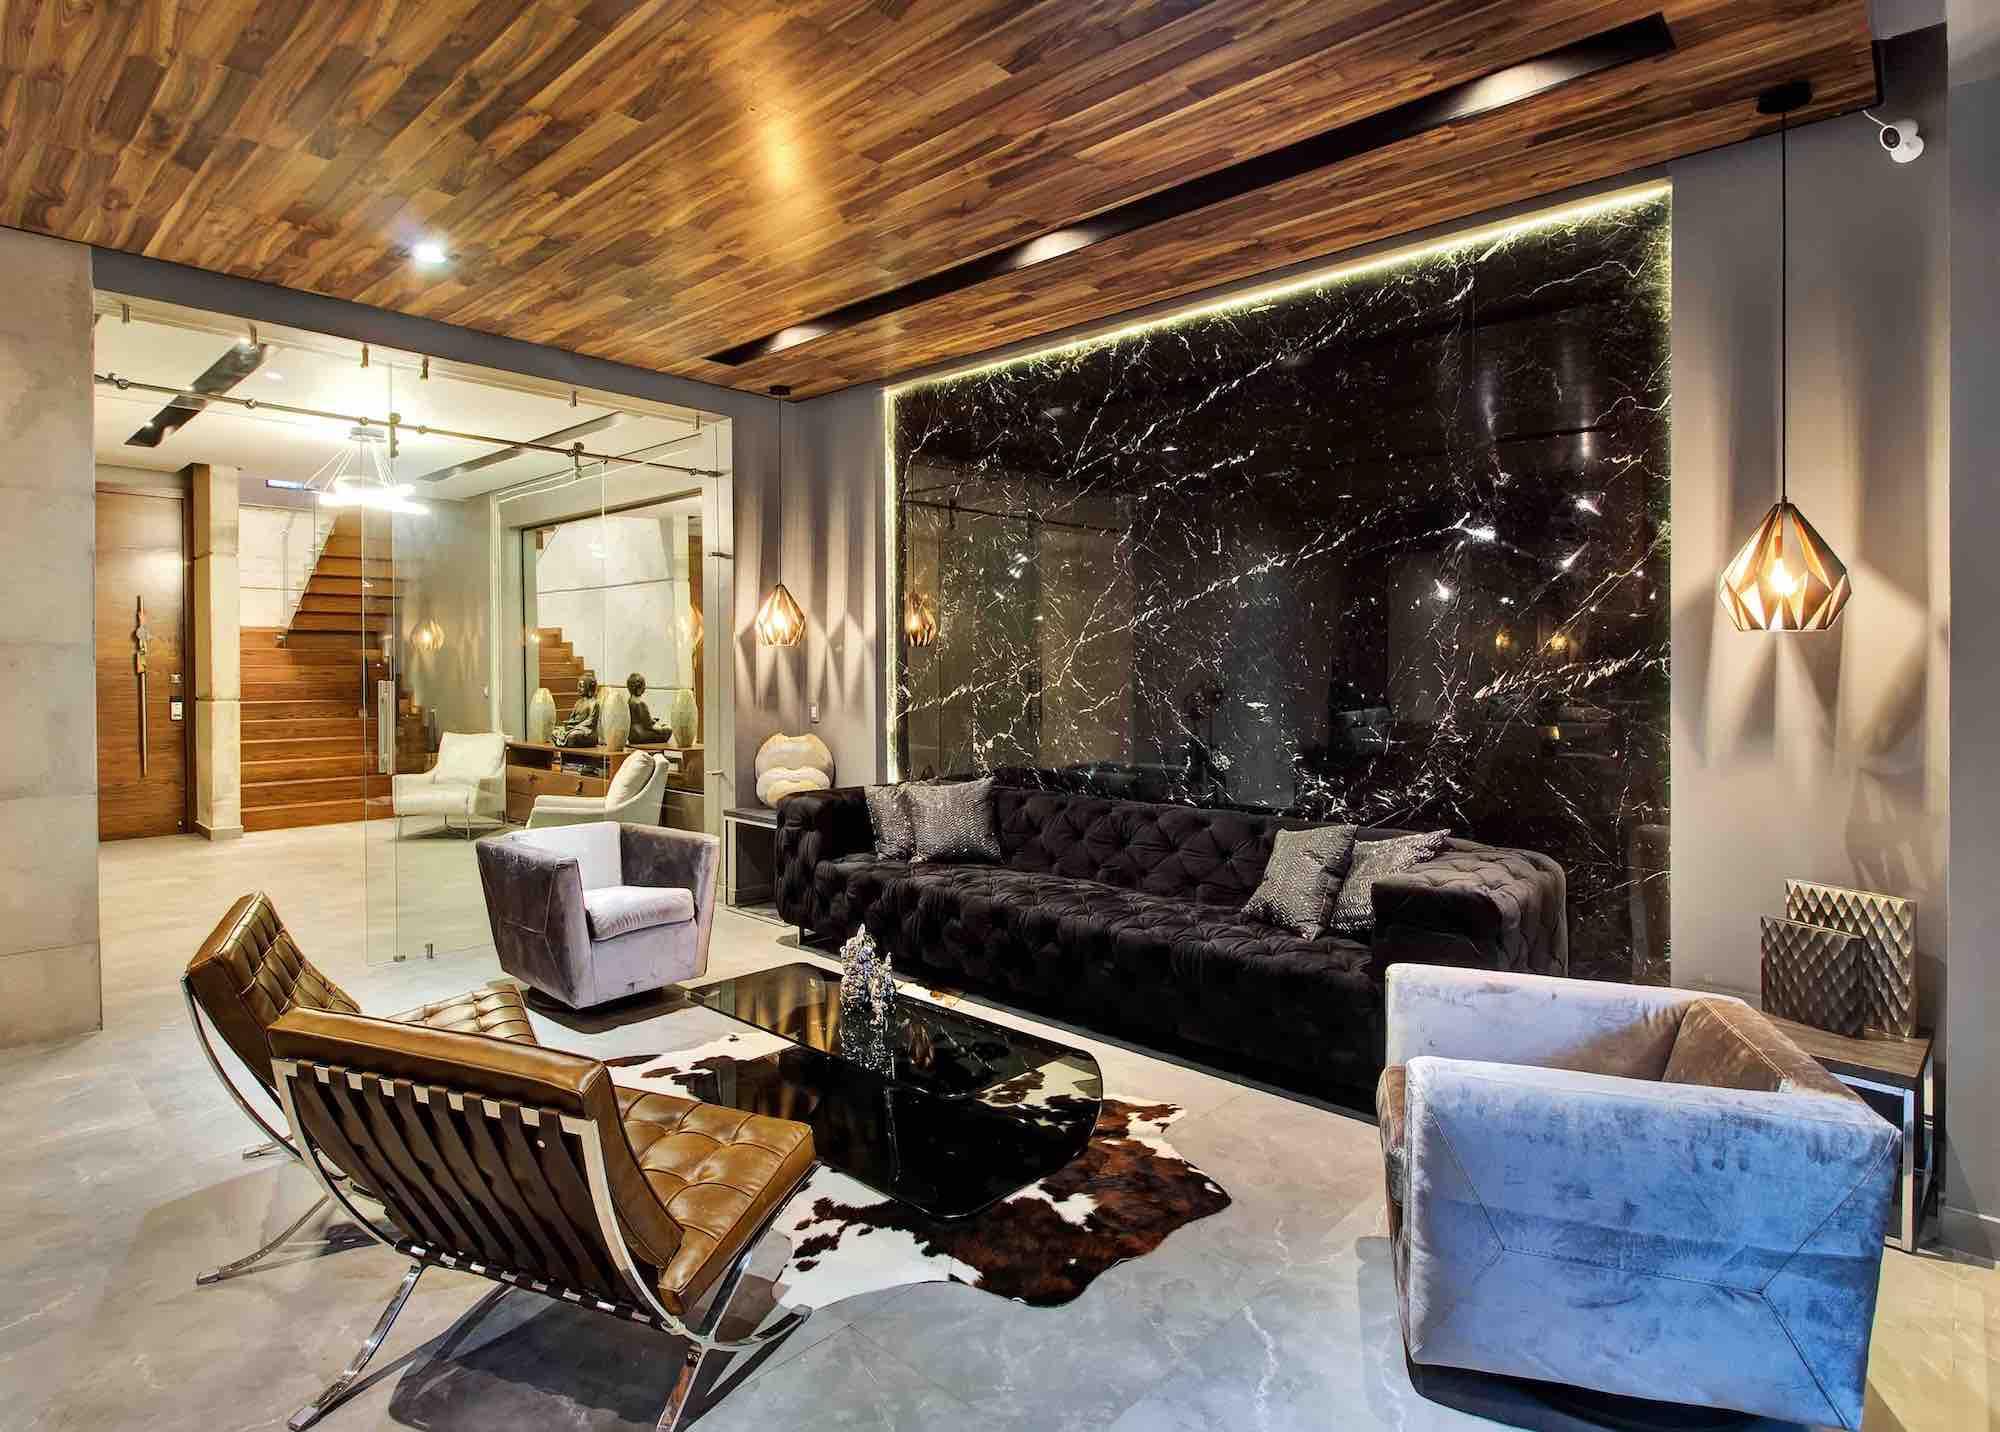 GR_House_Gallardo_arquitectura_amazingarchitecture_mexico_011.jpg